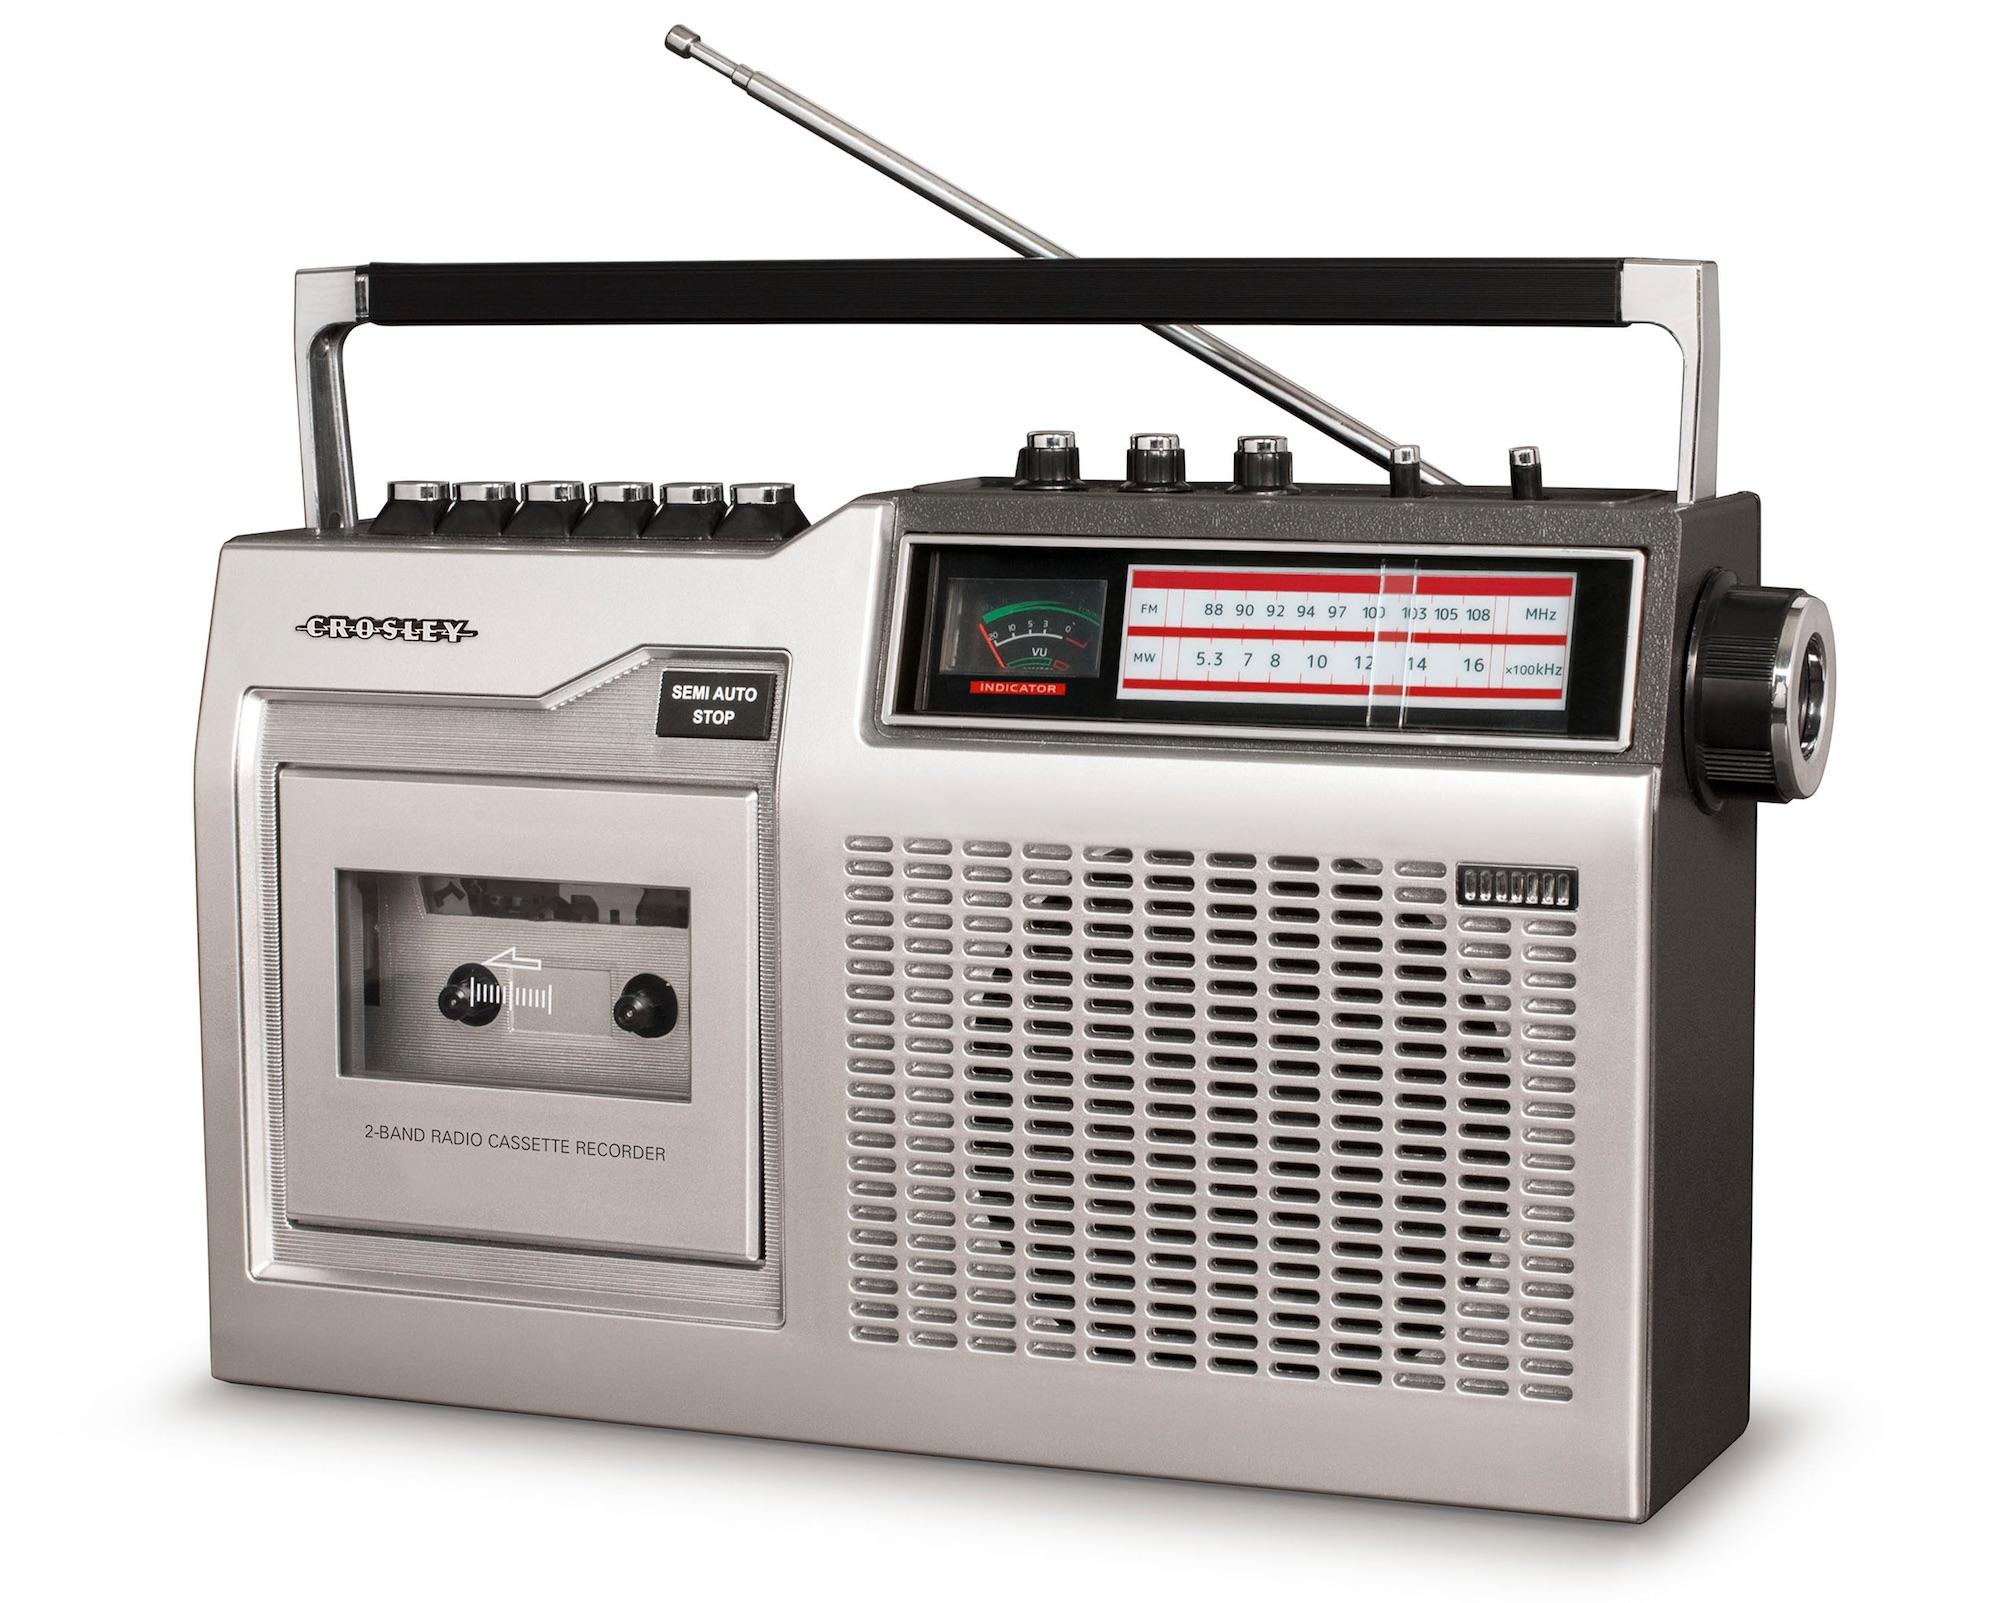 Crosley retro kaset çalar